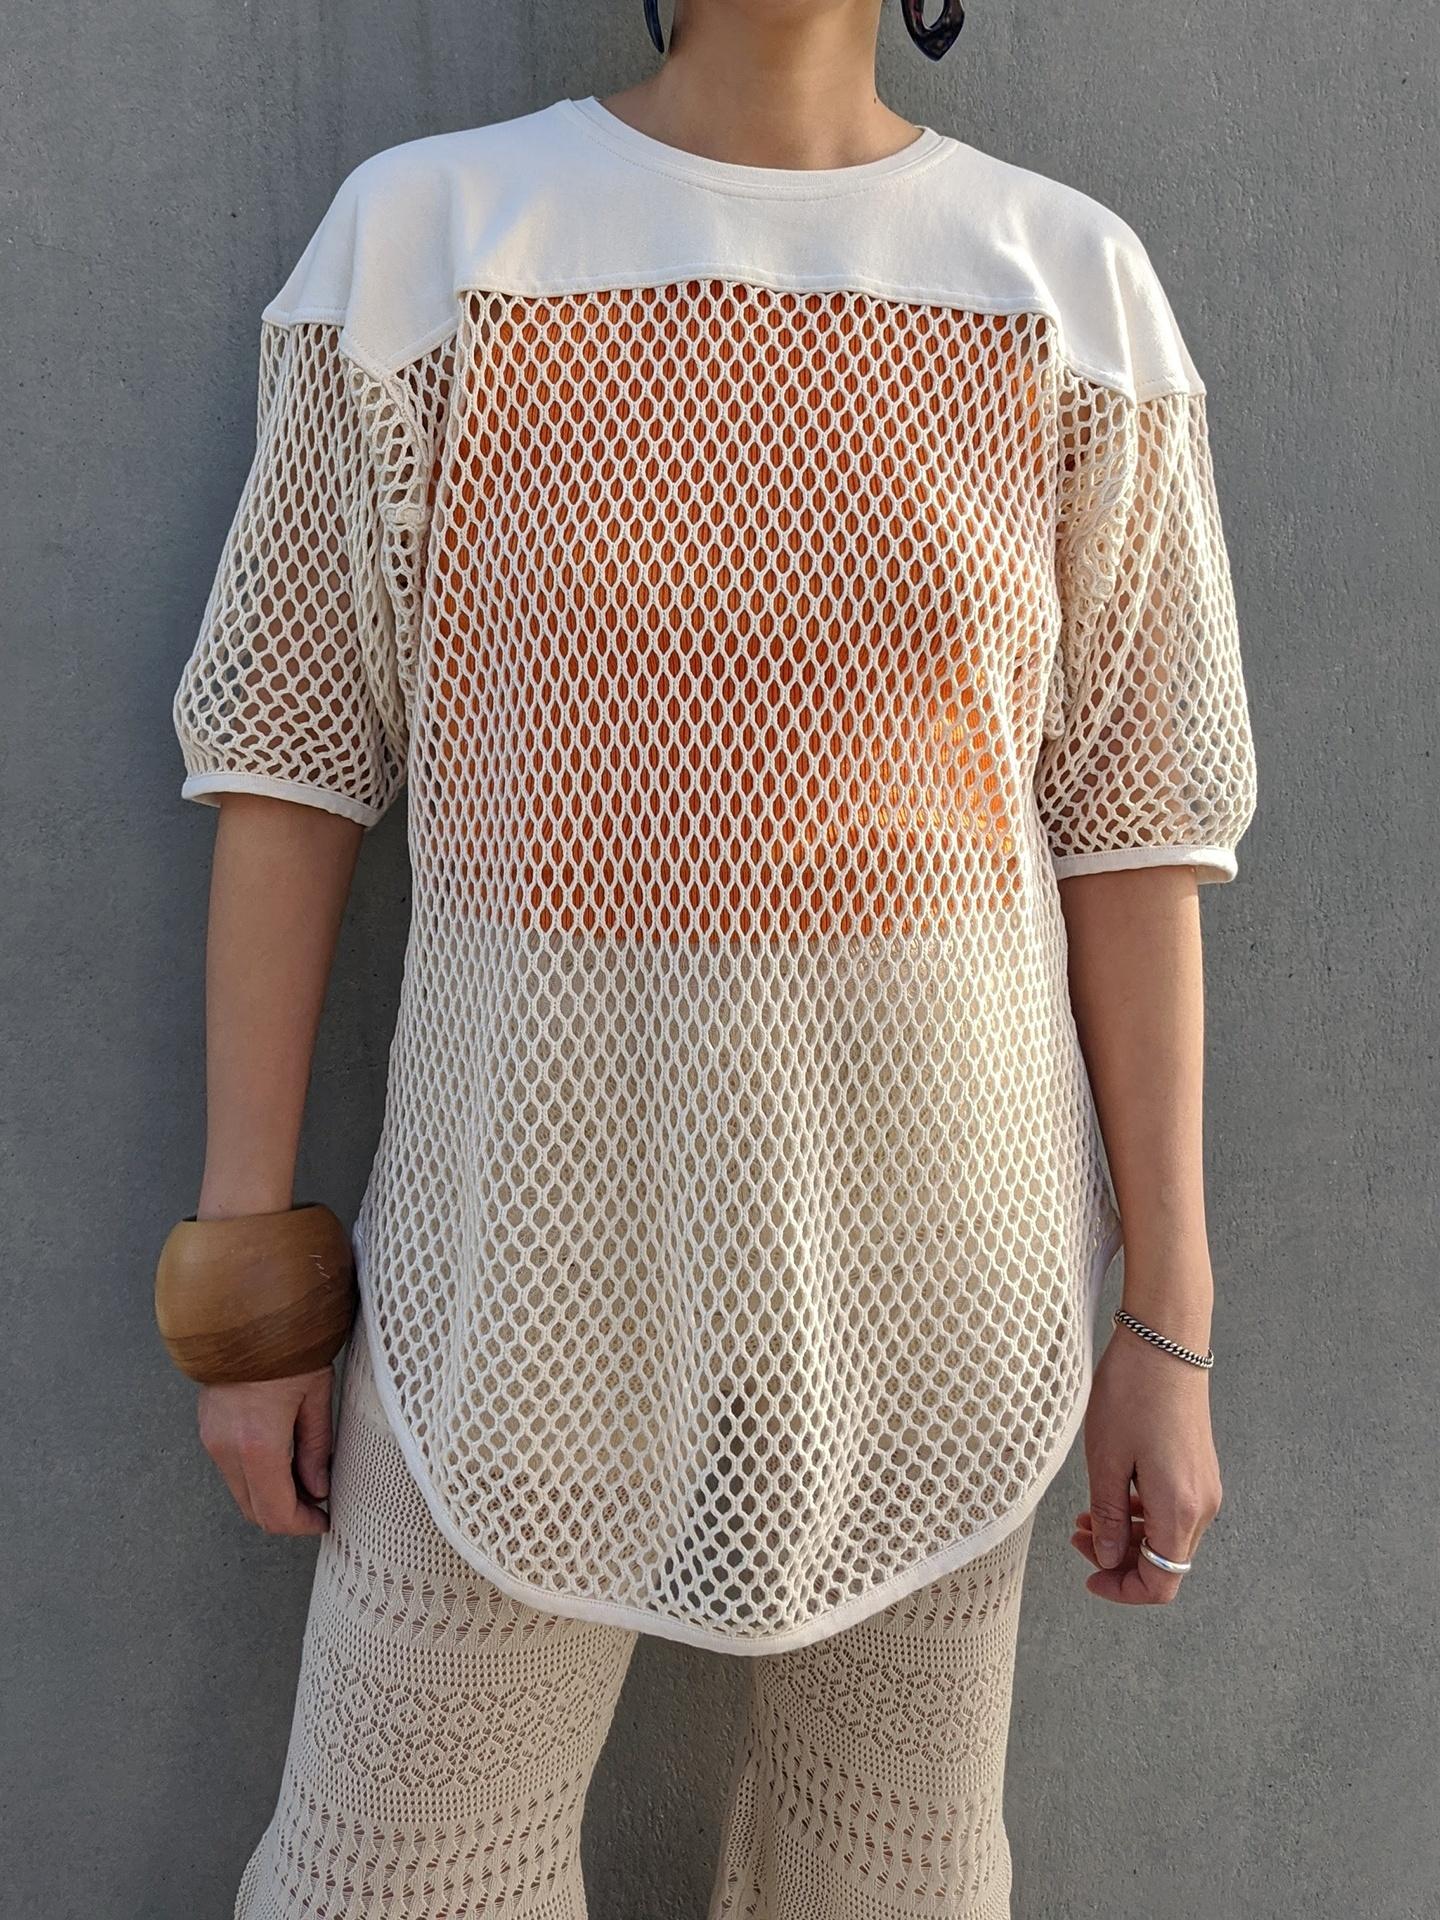 Cotton Net Tee - IVORY